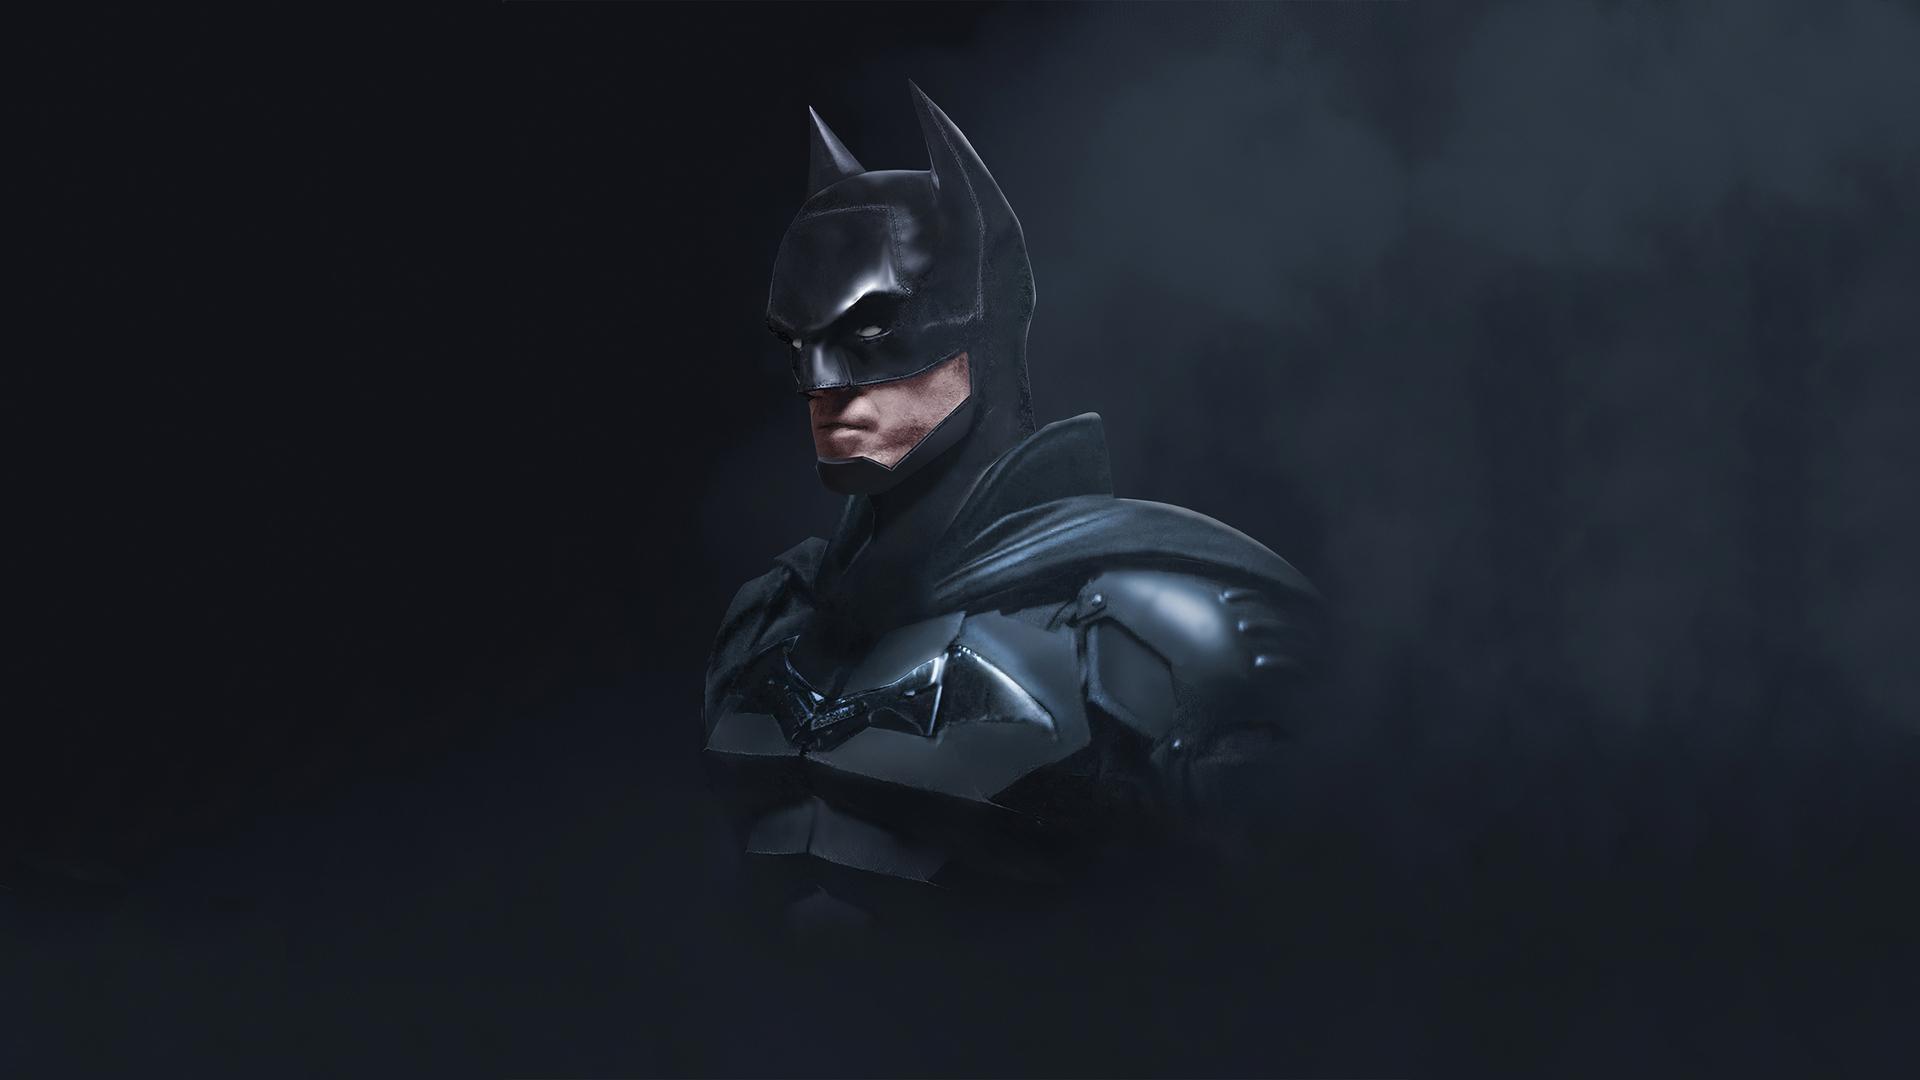 1920x1080 Batman New Suit 2020 Laptop Full HD 1080P HD 4k ...